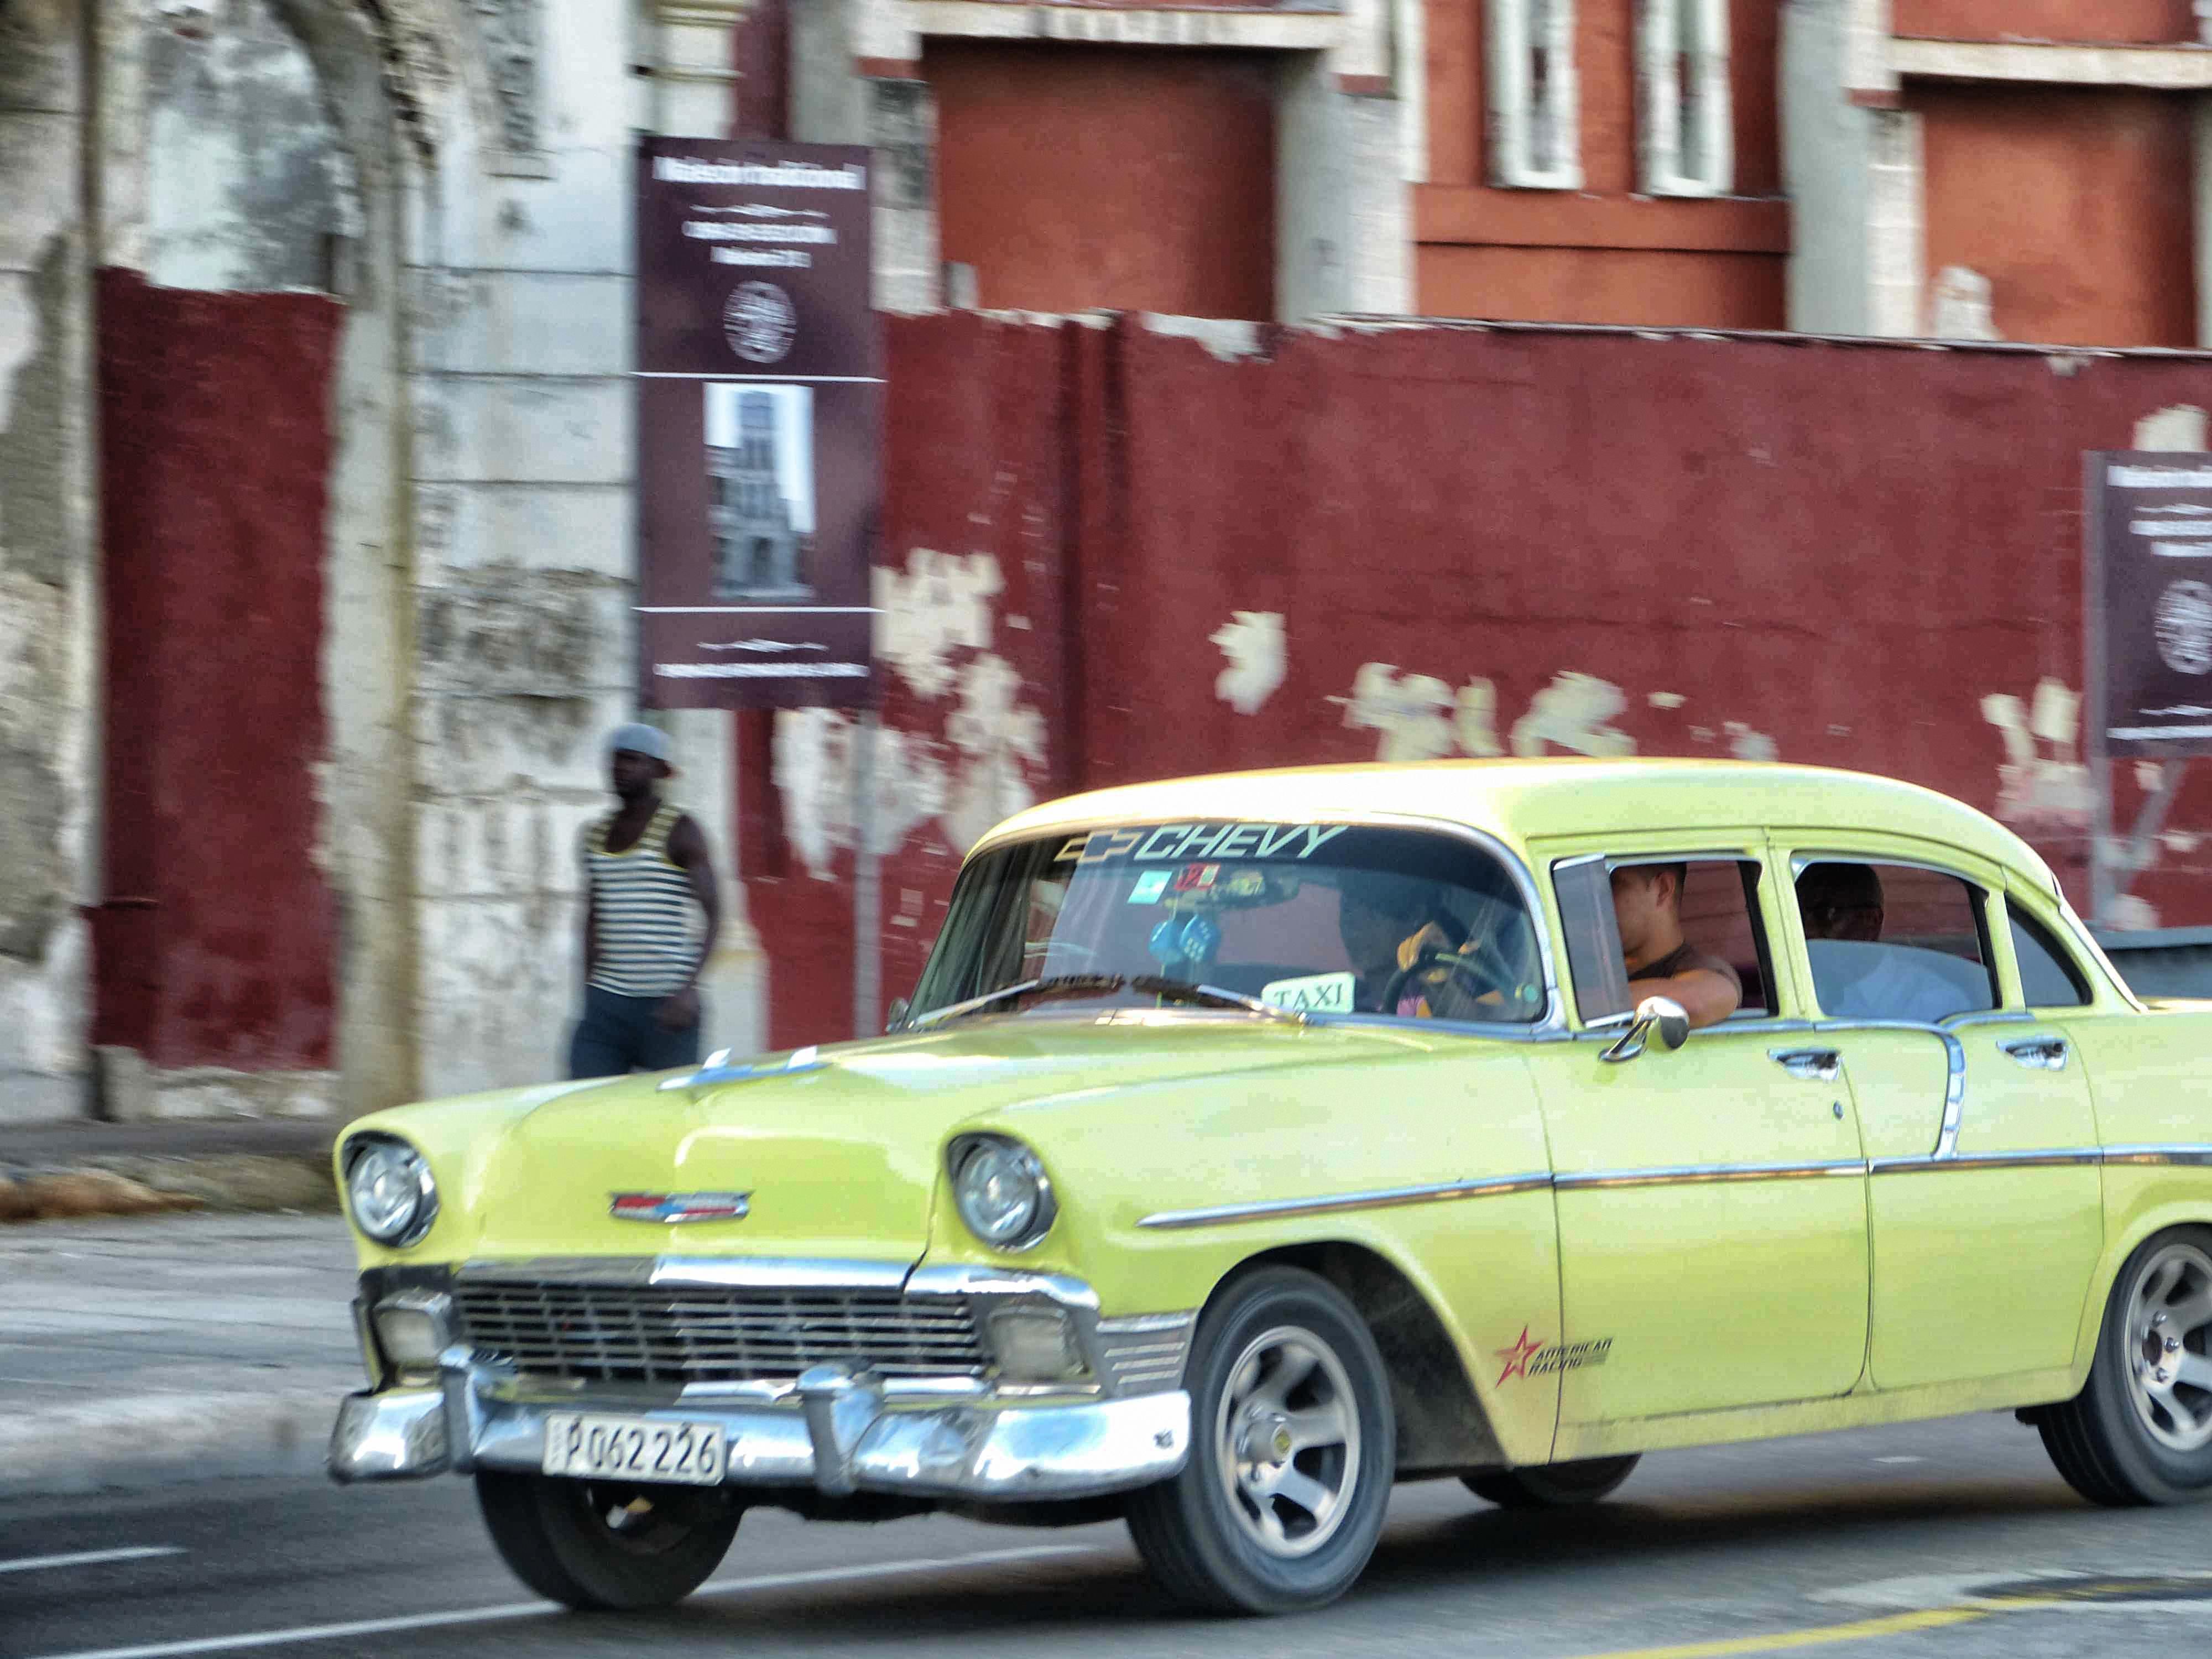 Colossal Cuba - Thirdeyemom